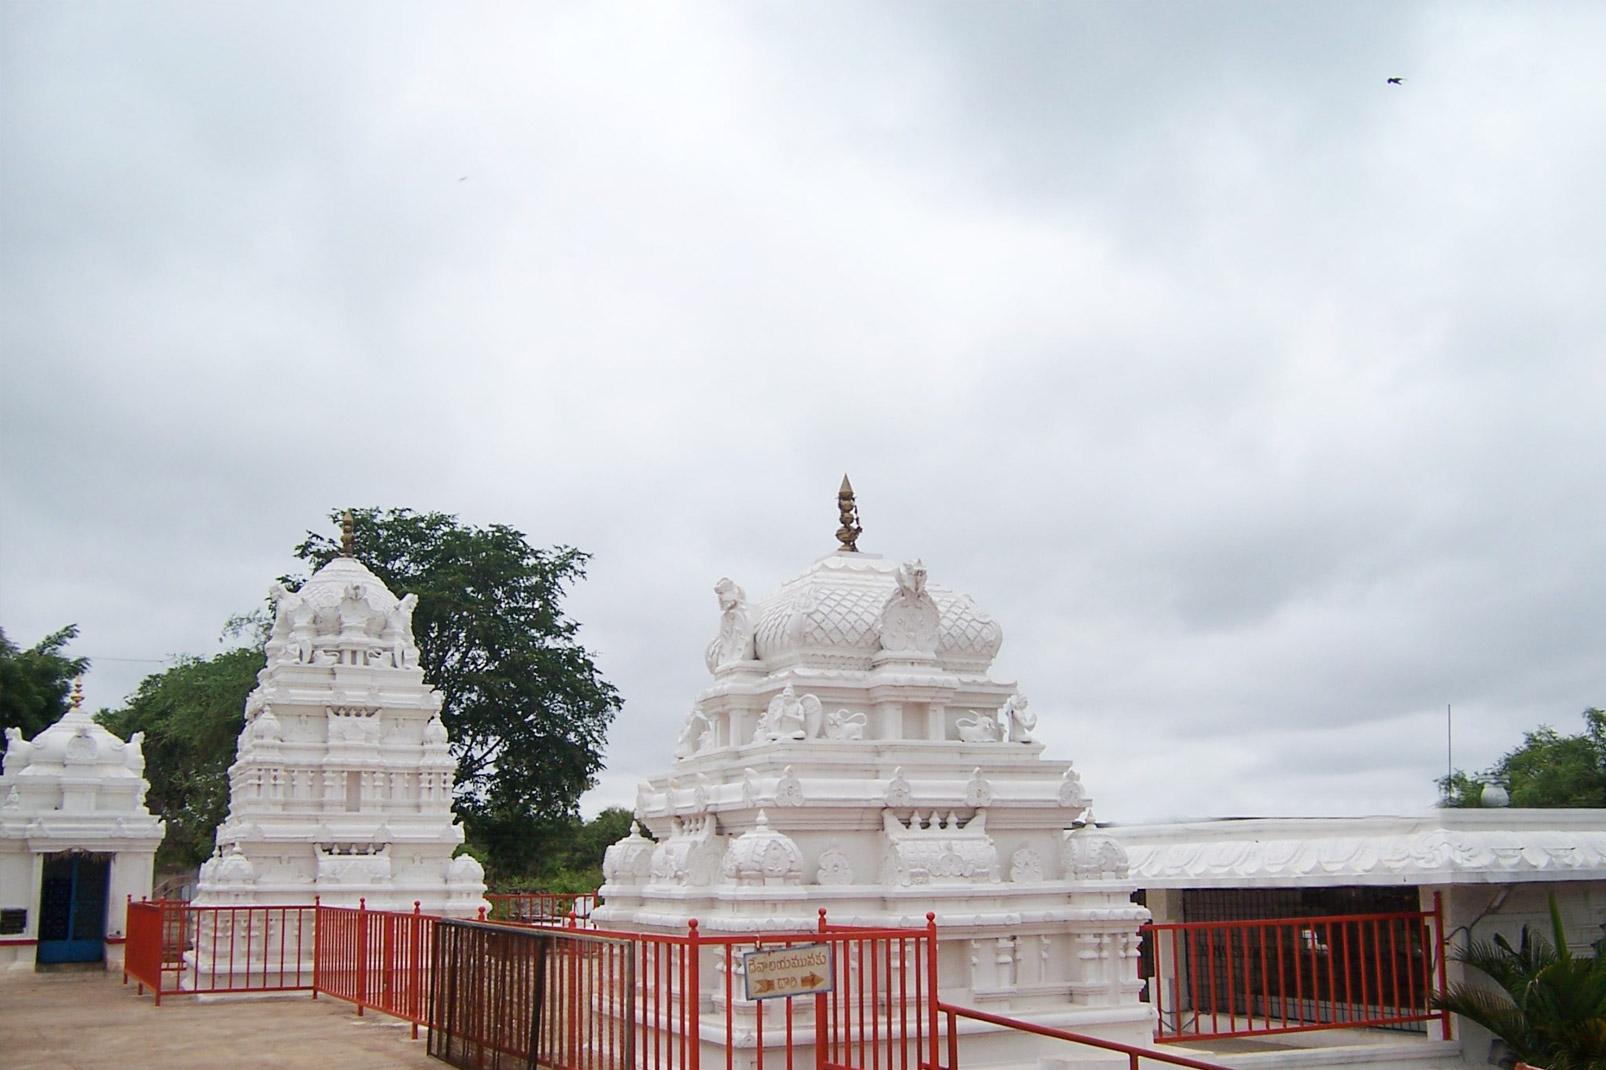 Anantha Padmanabha Swamy Temple